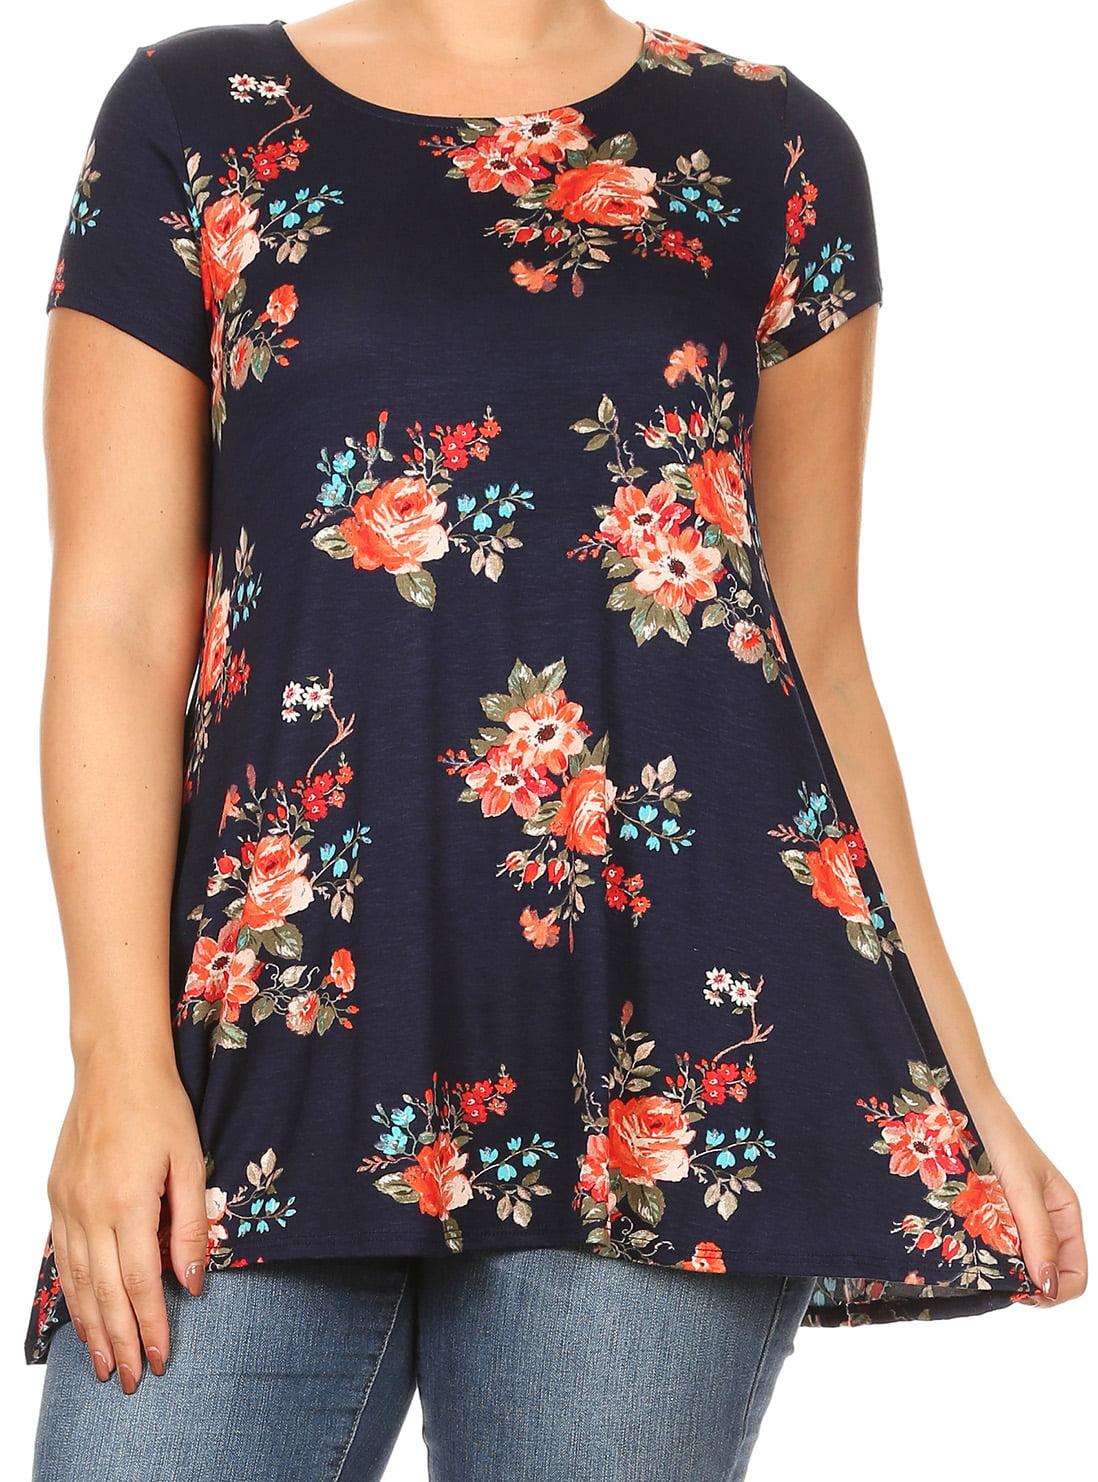 Women Plus Size Short Sleeve Floral Print Asymmetric Tunic Knit Top Tee Shirt Navy XL B0216